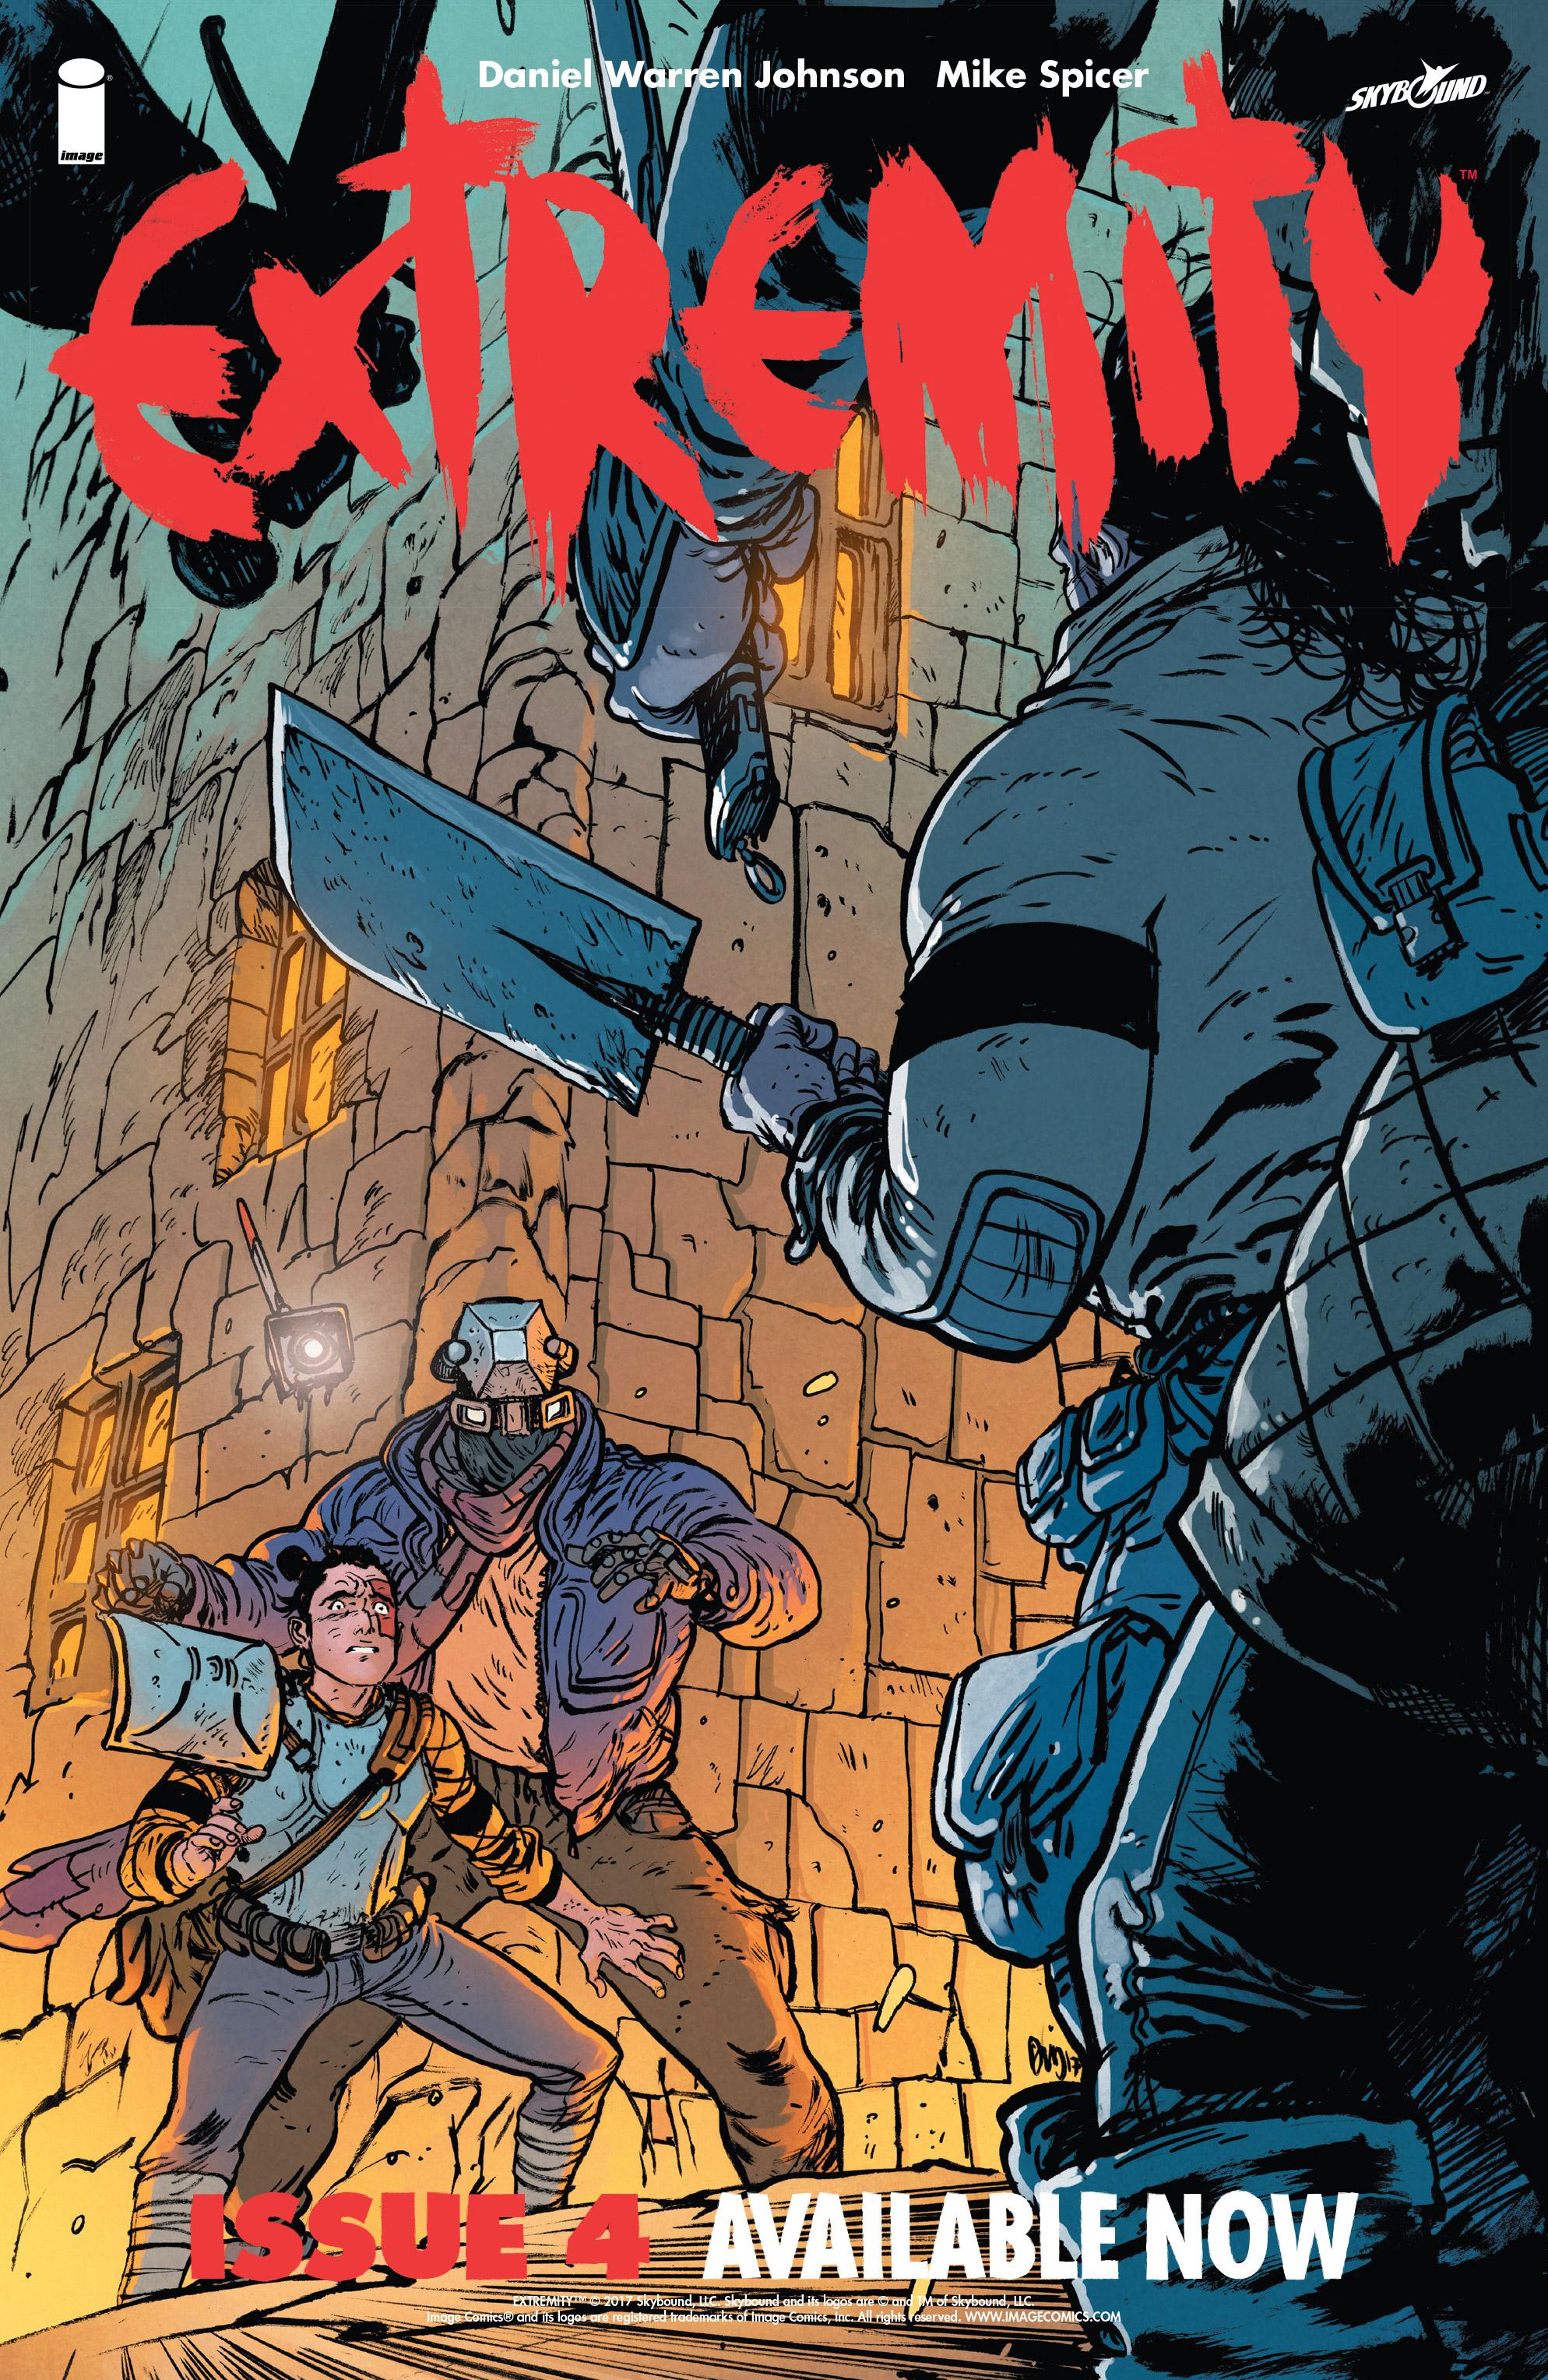 Read online Outcast by Kirkman & Azaceta comic -  Issue #28 - 25